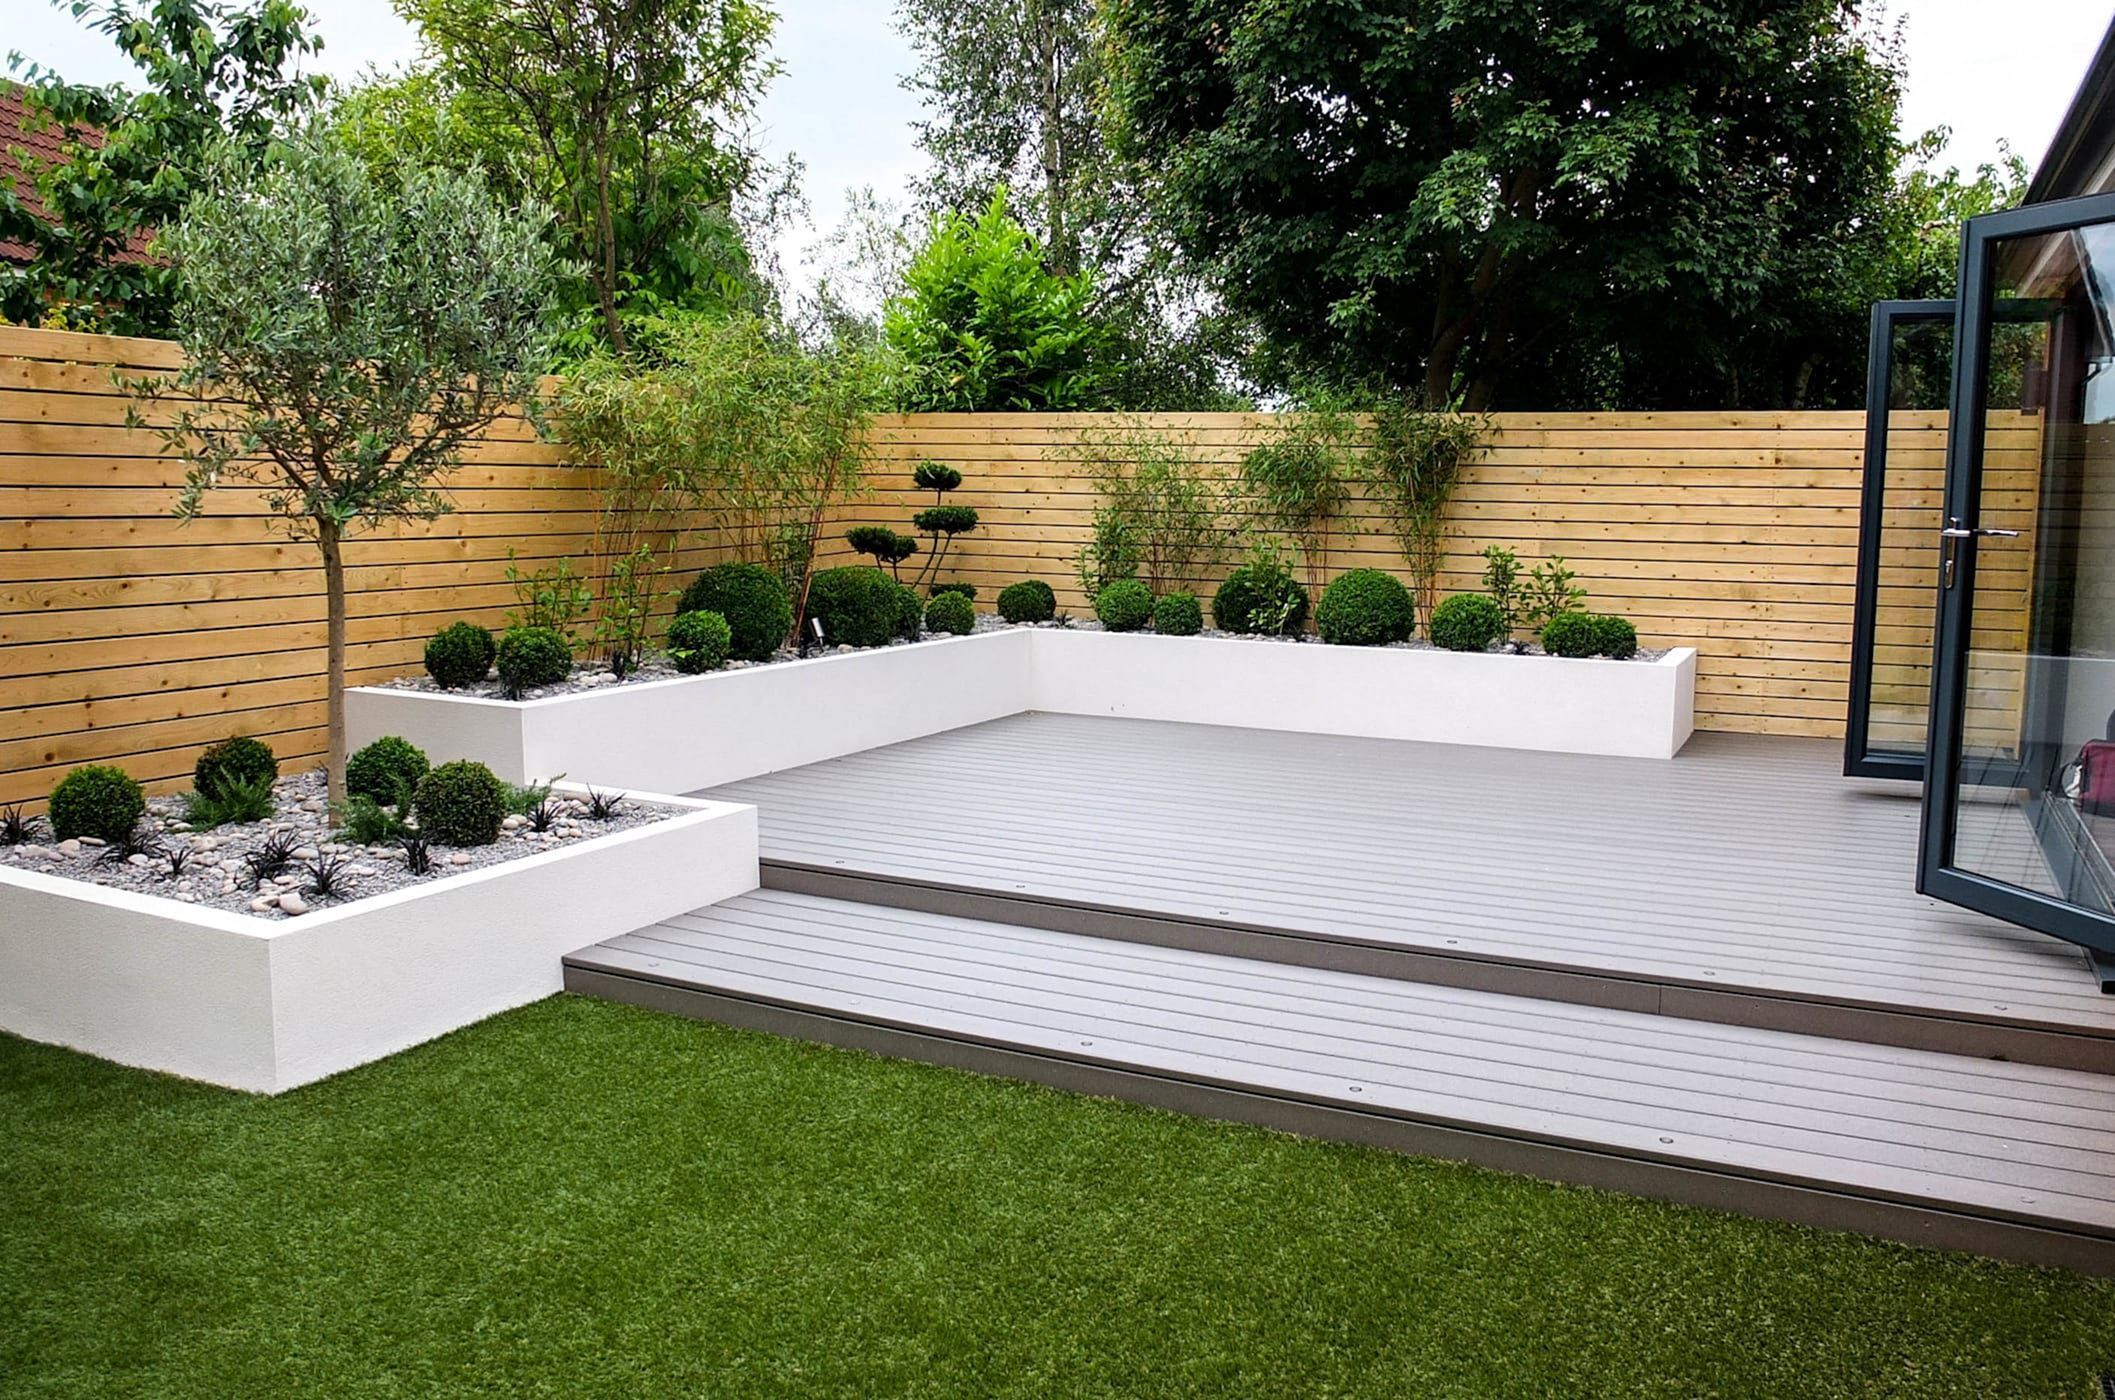 Plants Garden Outdoor 10 Top Modern Small Garden Style For Minimalist Houses Ideas In 2020 Minimalist Garden Backyard Design Small Garden Design